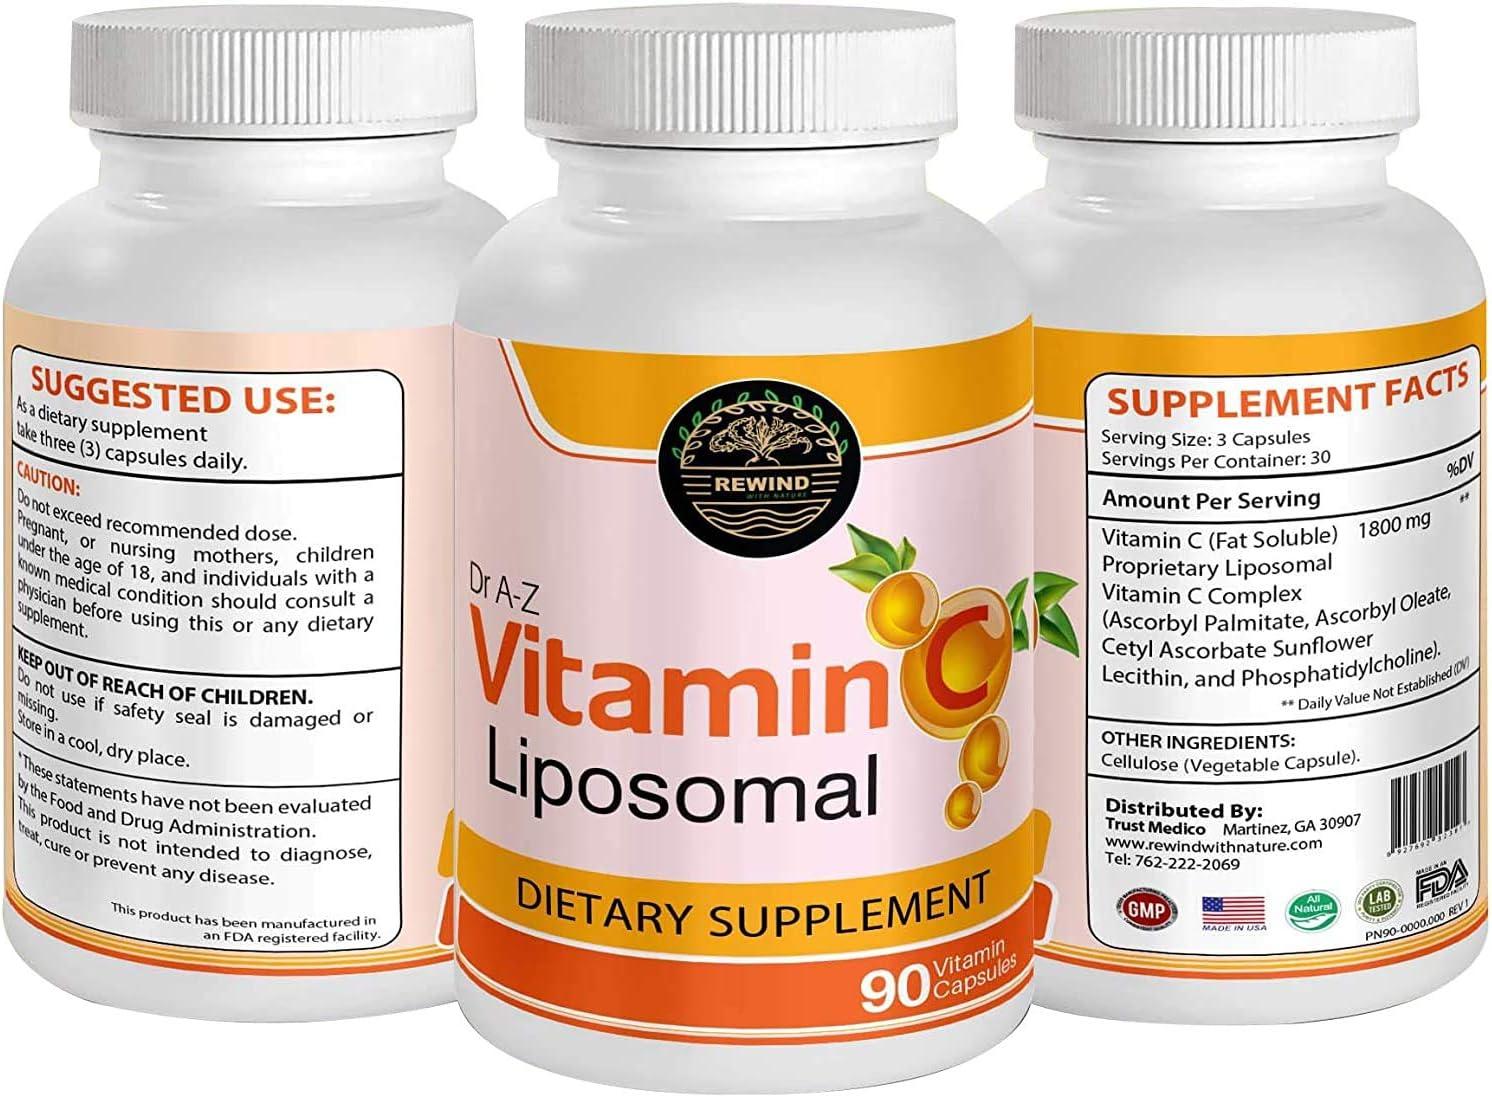 Liposomal Vitamin C Immune Defense, Support - 1800mg Supplement - Ascorbic Acid Capsules - High Absorption VIT C Pills - Boosts Immune, Collagen Health - Non-GMO, Soy Free